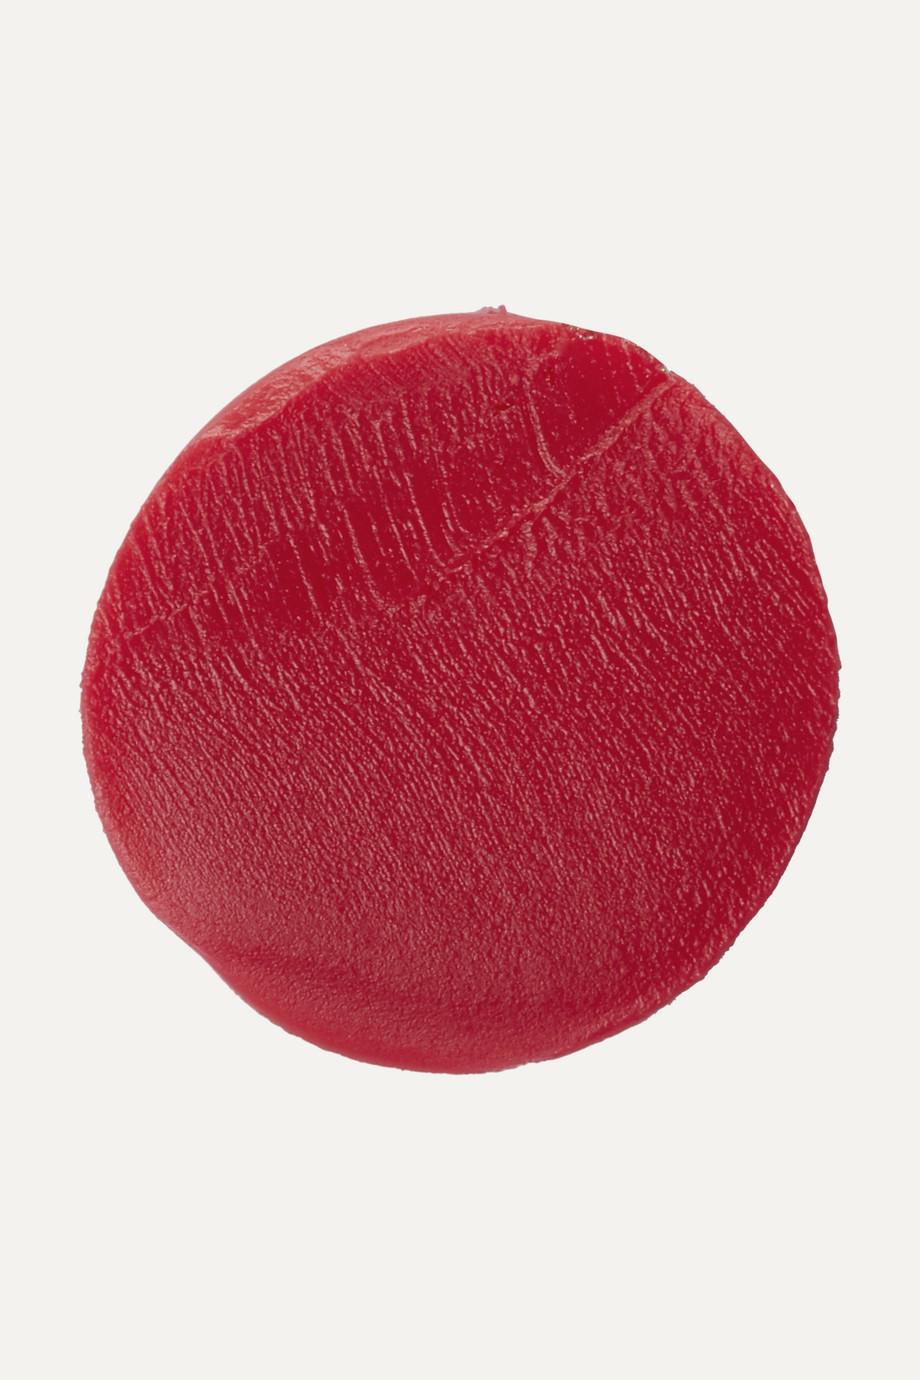 Gucci Beauty Rouge à Lèvres Voile - Diana Amber 508